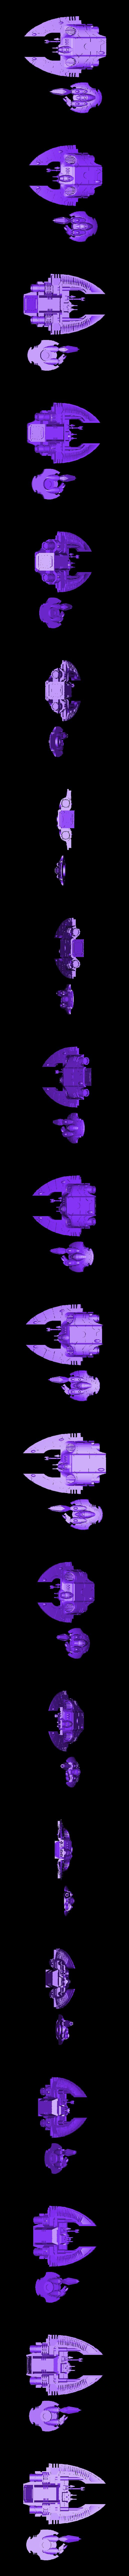 SpaceElfFloatingTankGemBlingEpicCommunity.stl Download free STL file Space Elf Tank Fire Gem For Resin Print • 3D printing object, barnEbiss2